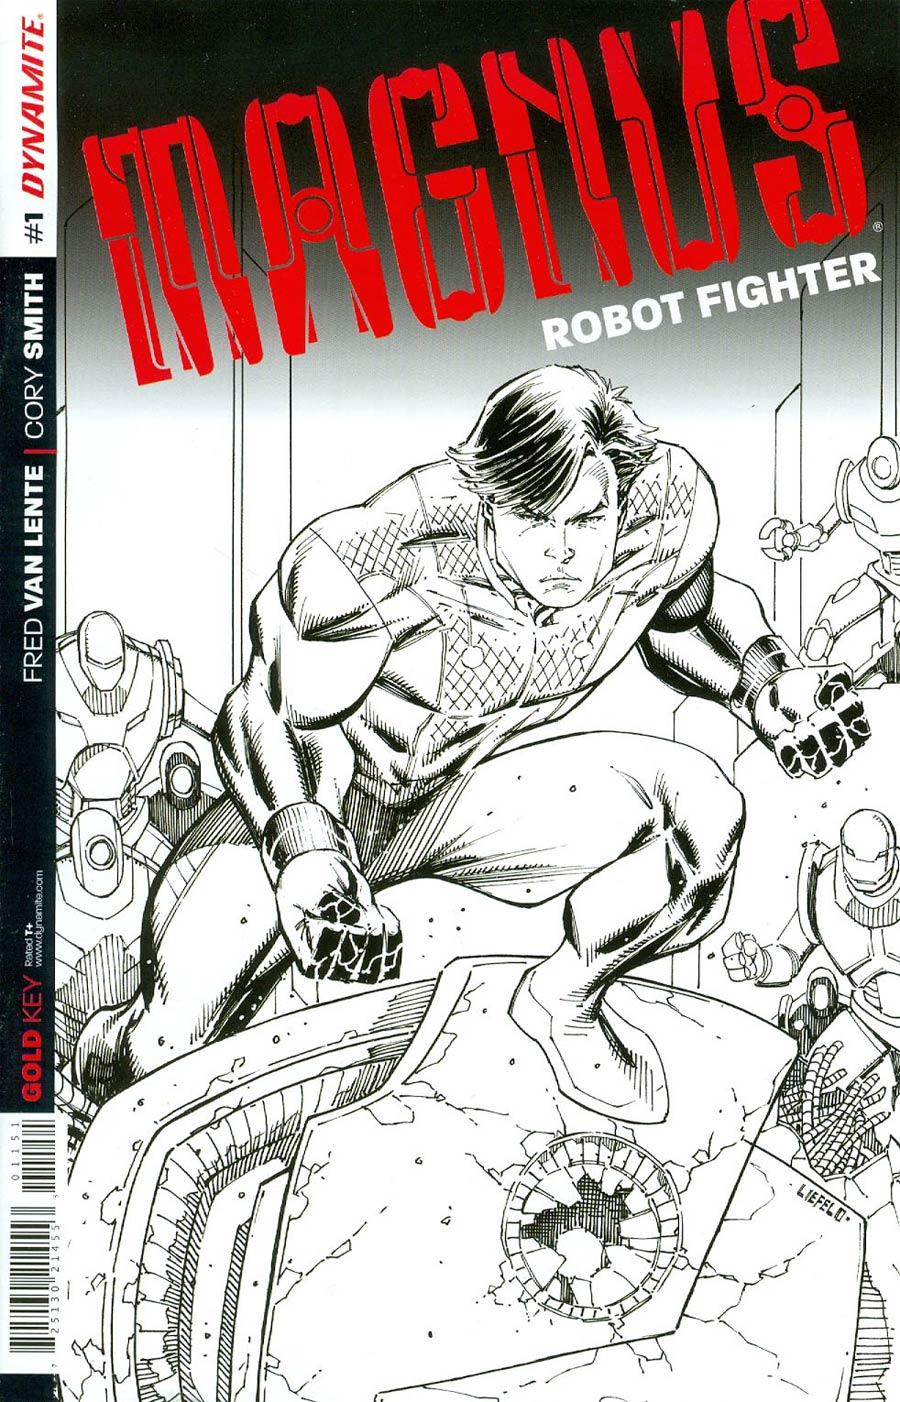 Magnus Robot Fighter Vol 4 #1 Cover G Incentive Rob Liefeld Black & White Retailer Premium Variant Cover